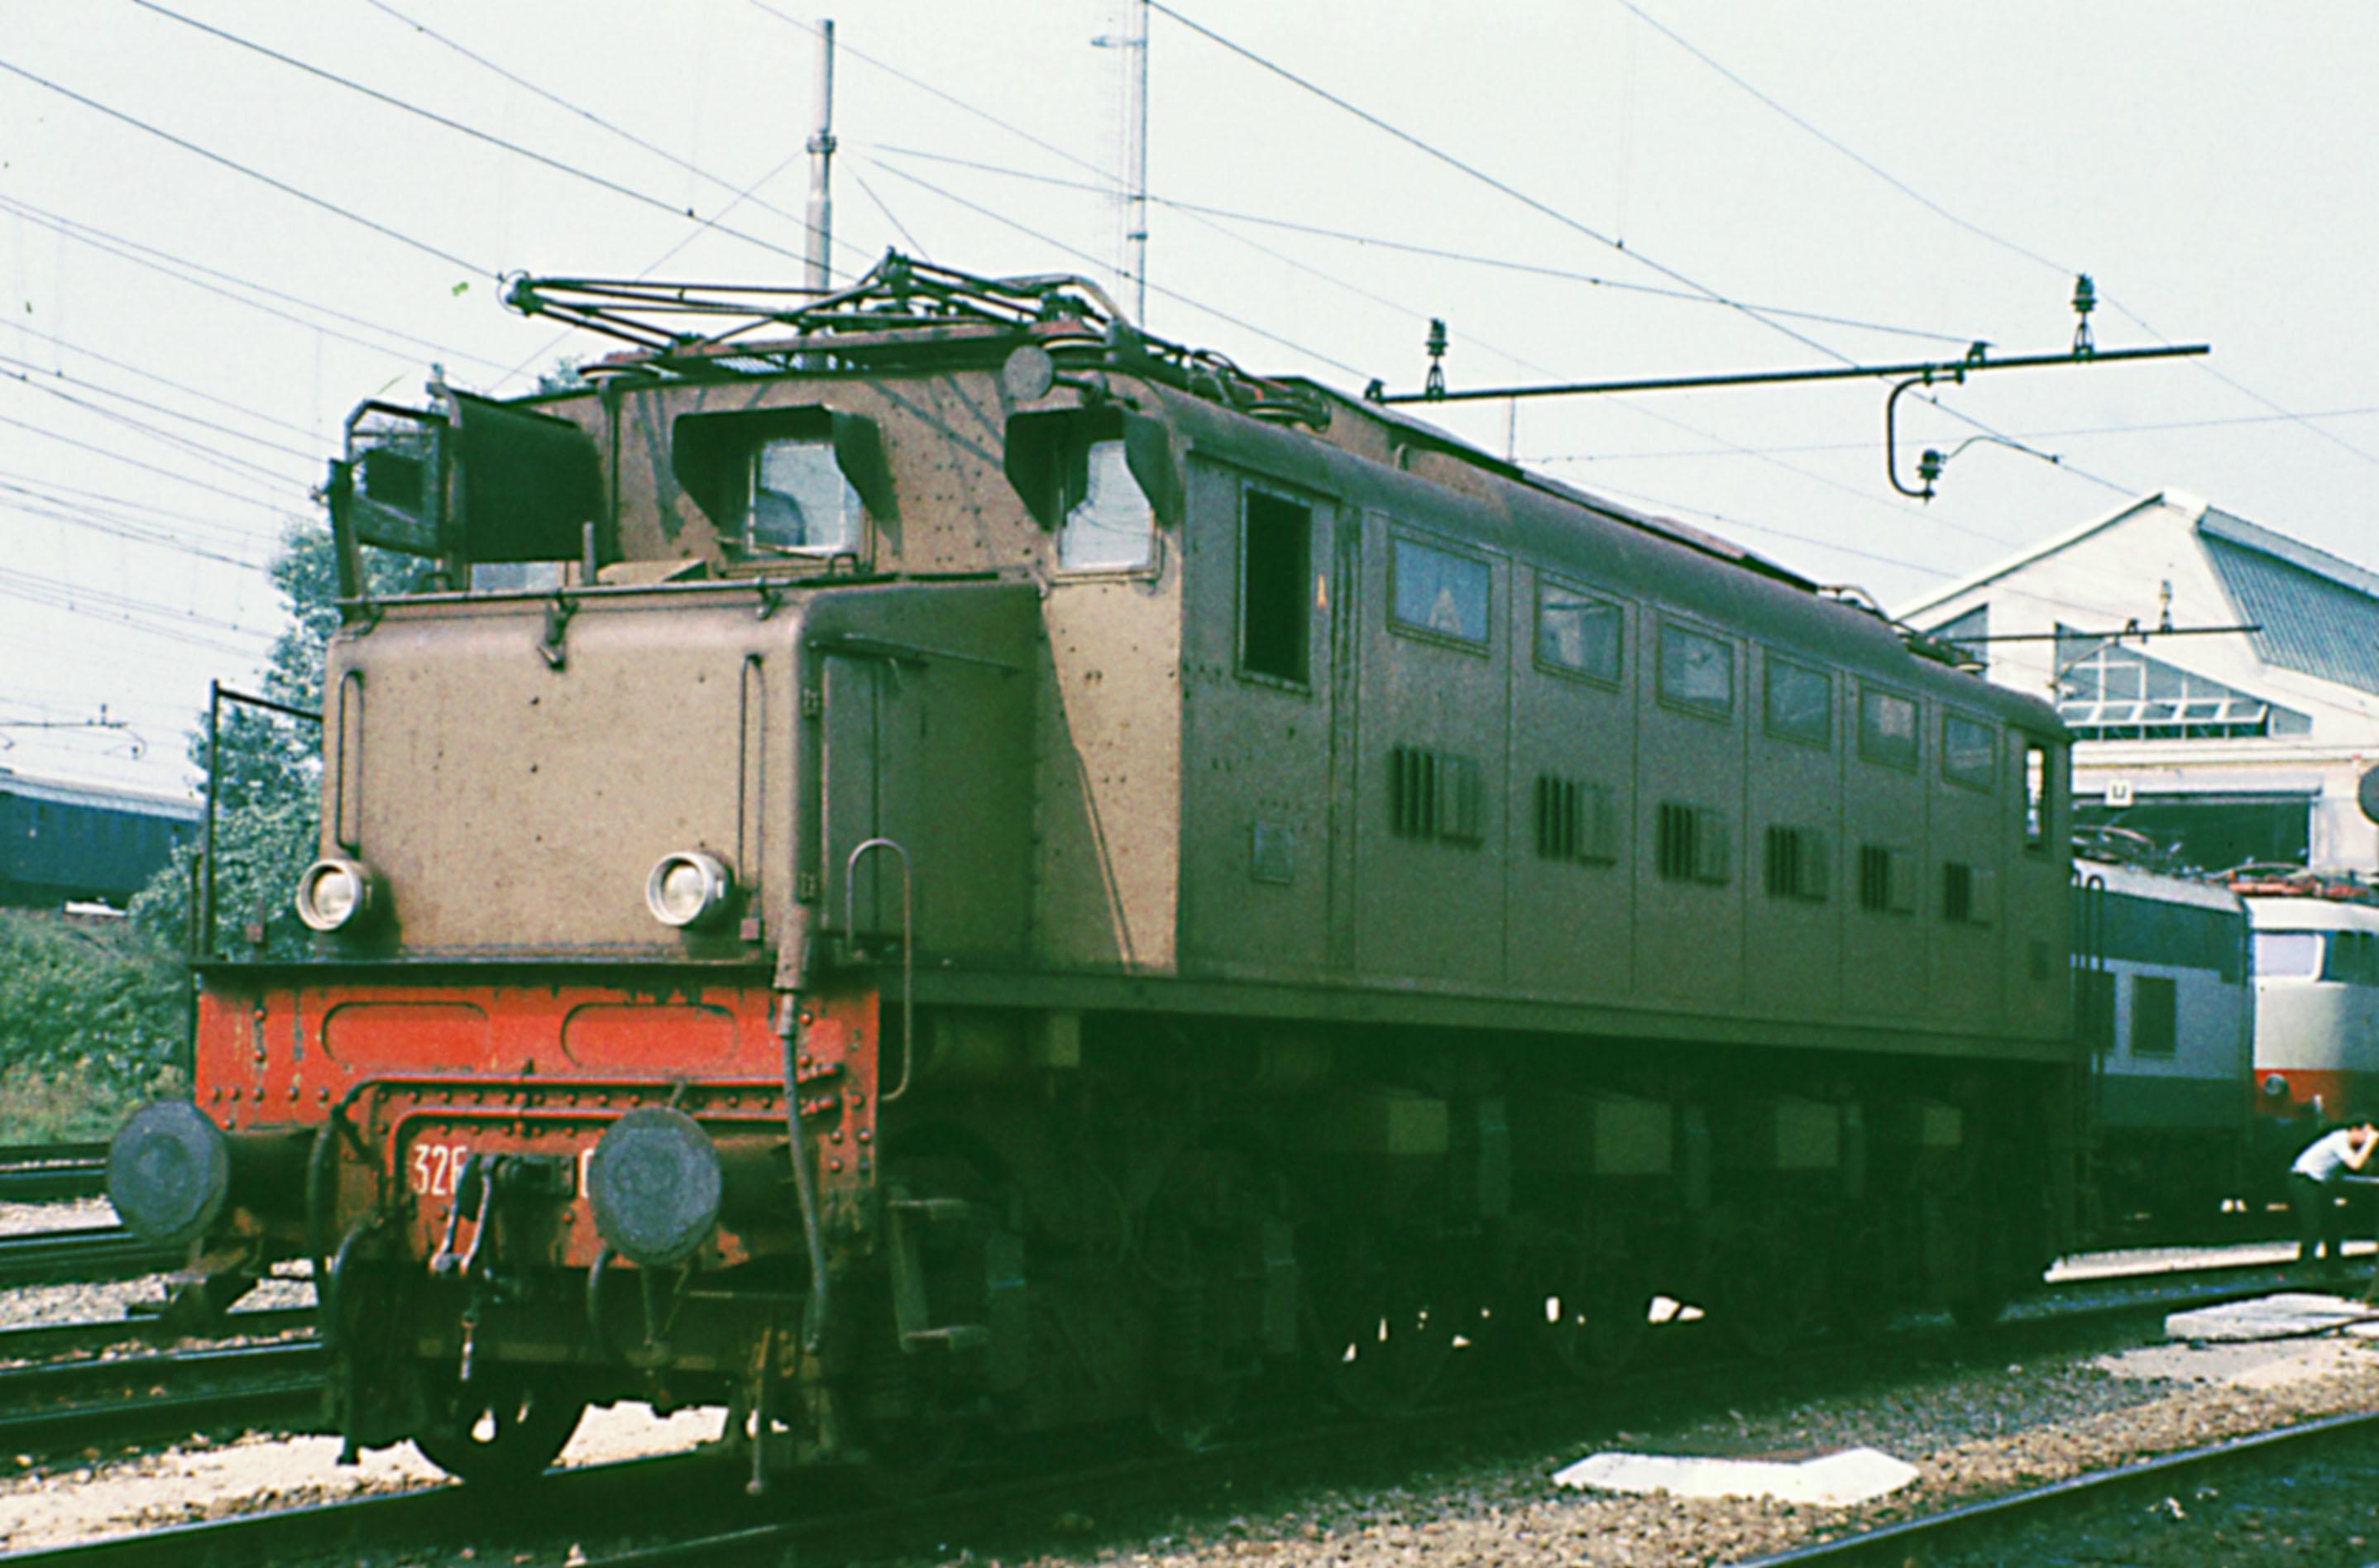 File:Locomotore E326.jpg - Wikimedia Commons